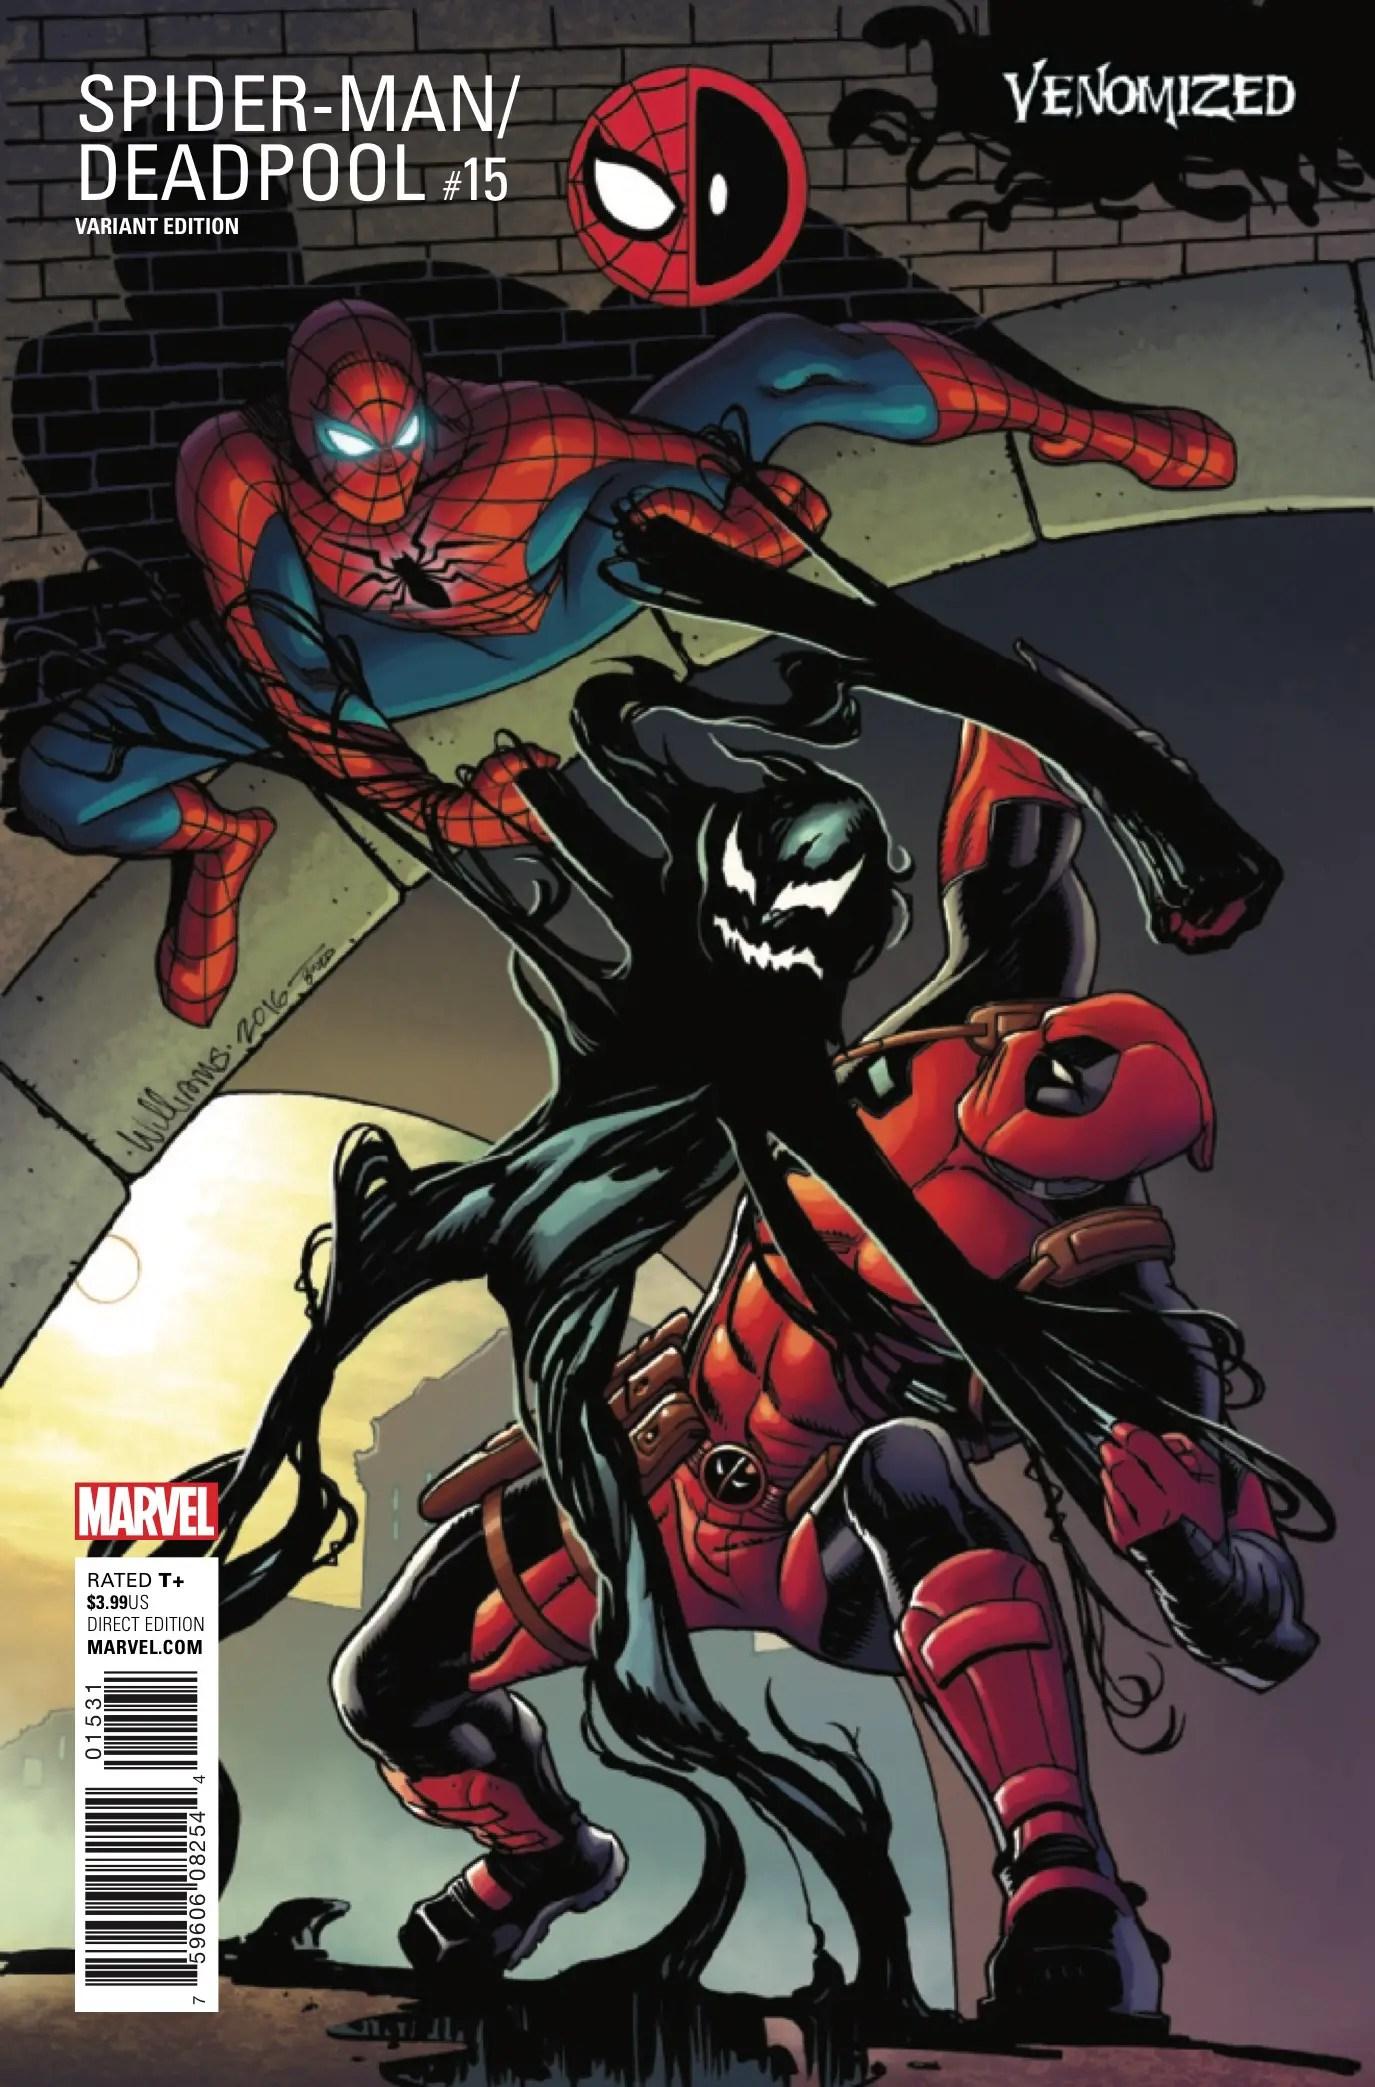 Spider-Man/Deadpool #15 Review